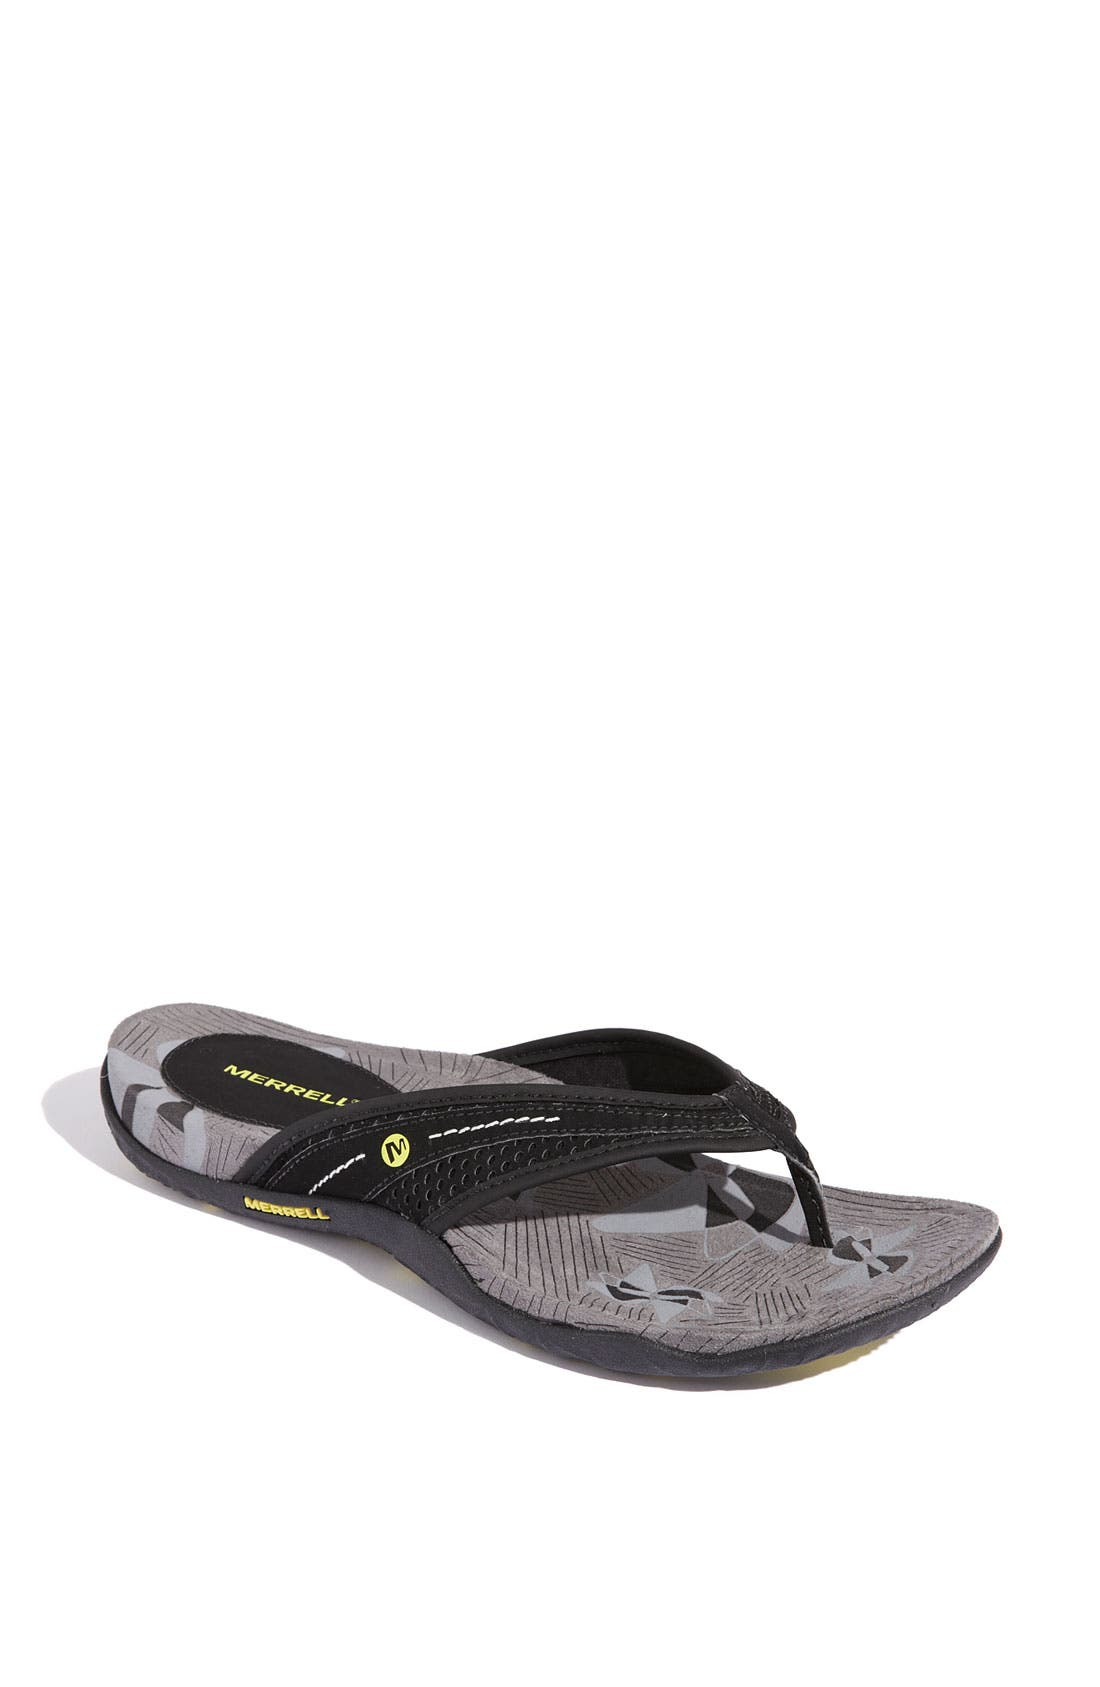 Alternate Image 1 Selected - Merrell 'Lorelei' Sandal